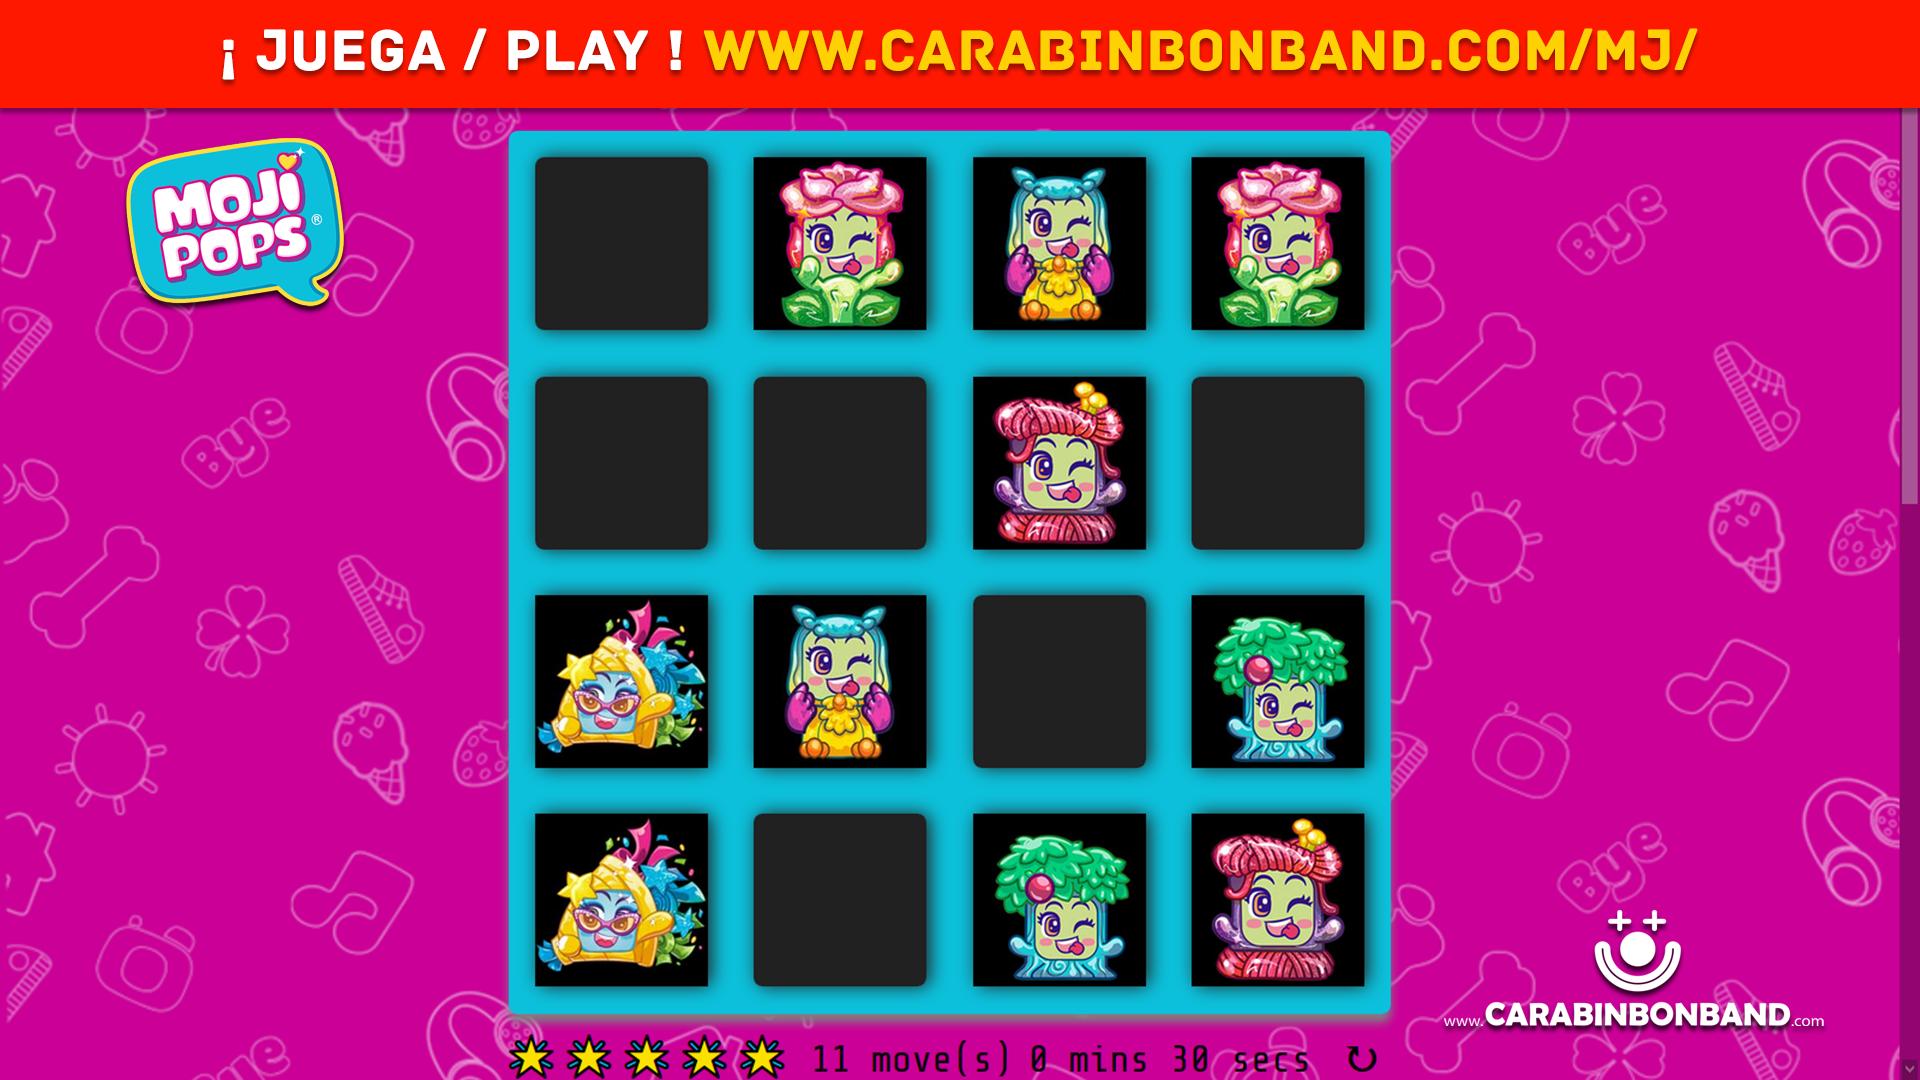 VIDEOJUEGO MOJIPOPS MEMORY GAME